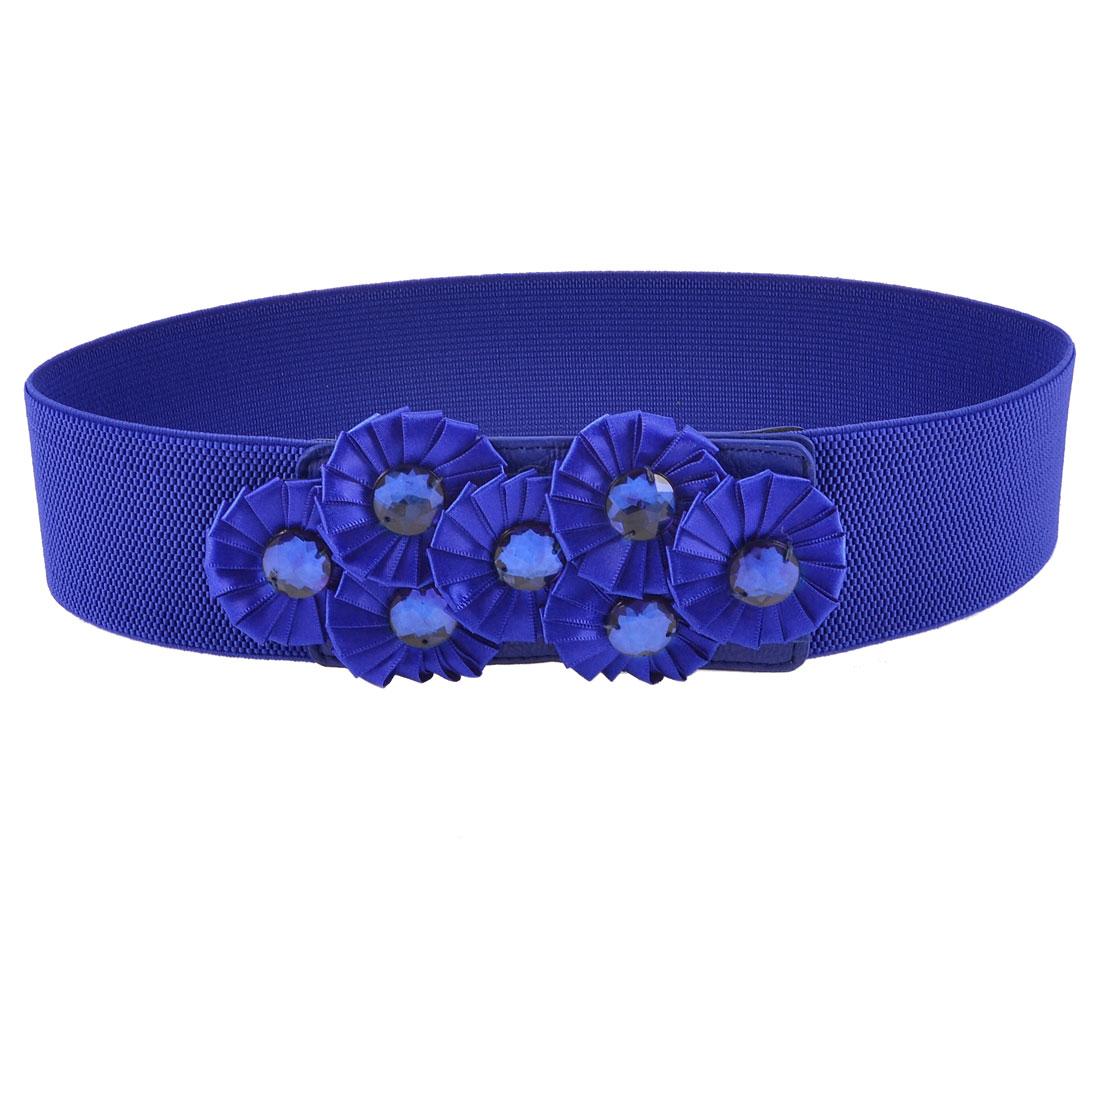 Press Stud Button Blue Flowers Faux Crystals Decor Cinch Waist Belt for Women